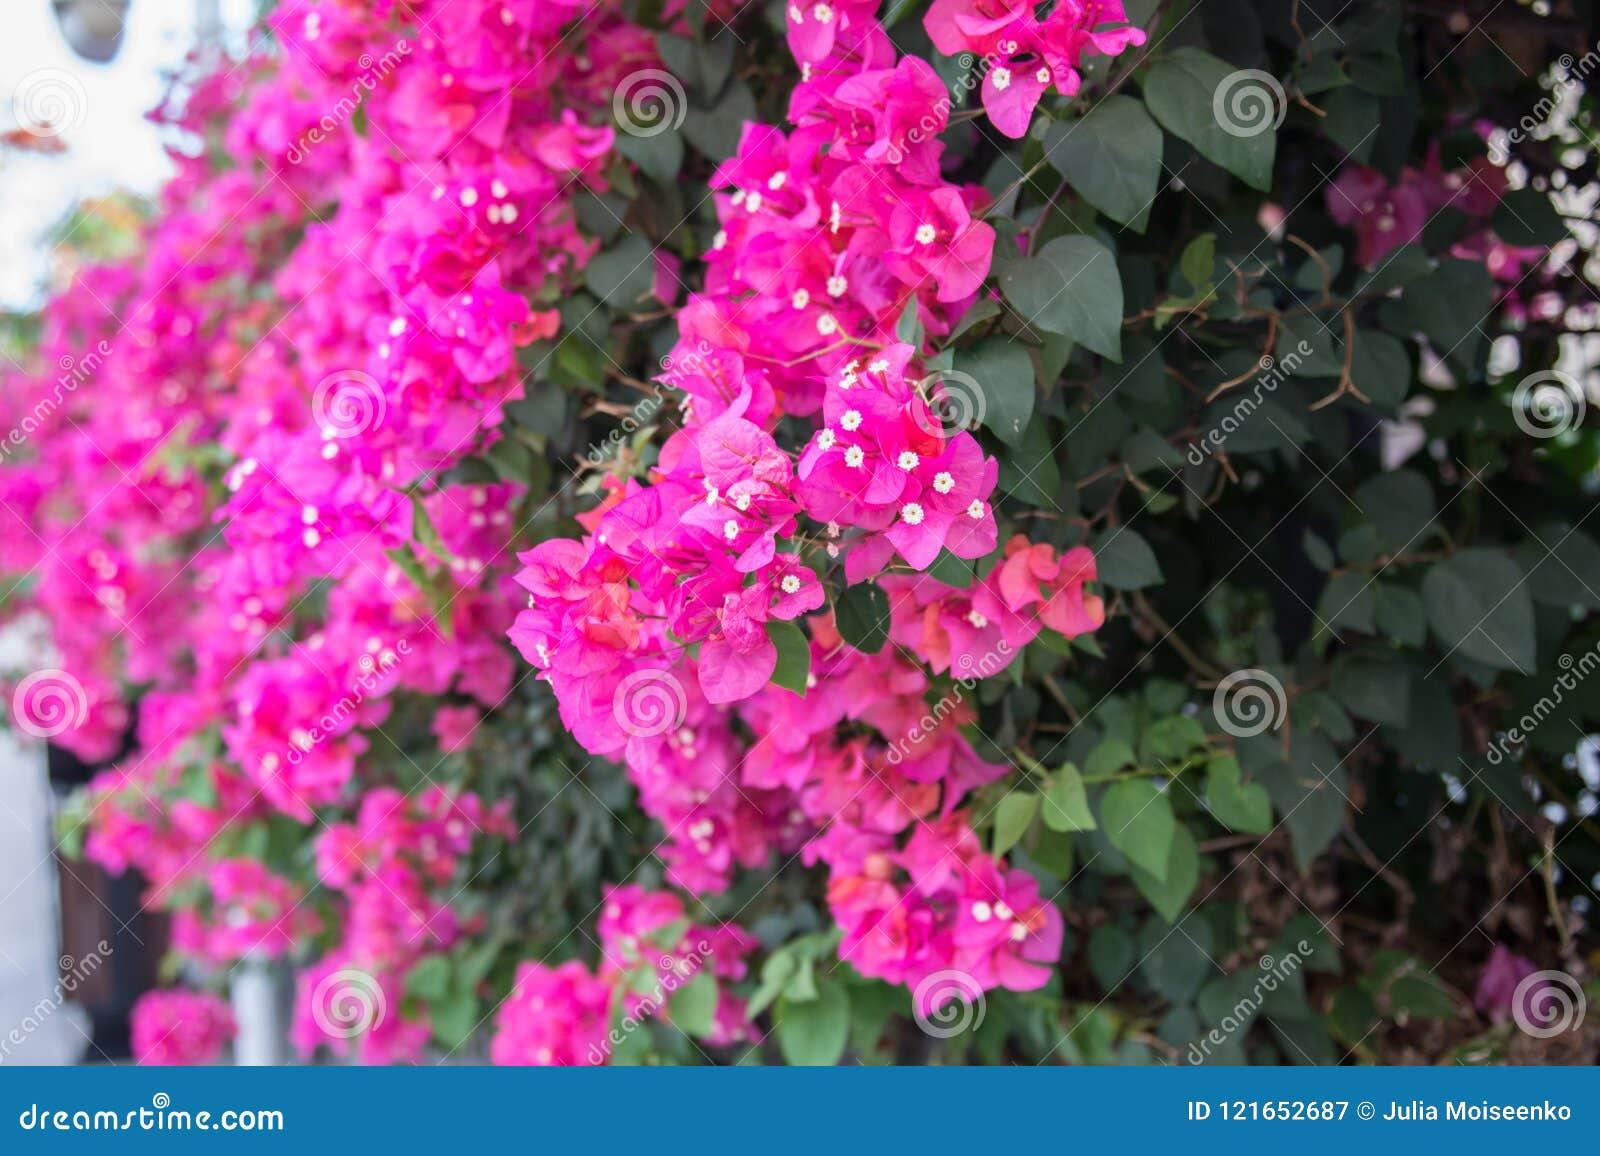 Beautiful tropical flowers the bush strizhennom ratut many bright download beautiful tropical flowers the bush strizhennom ratut many bright juicy colors in hot izmirmasajfo